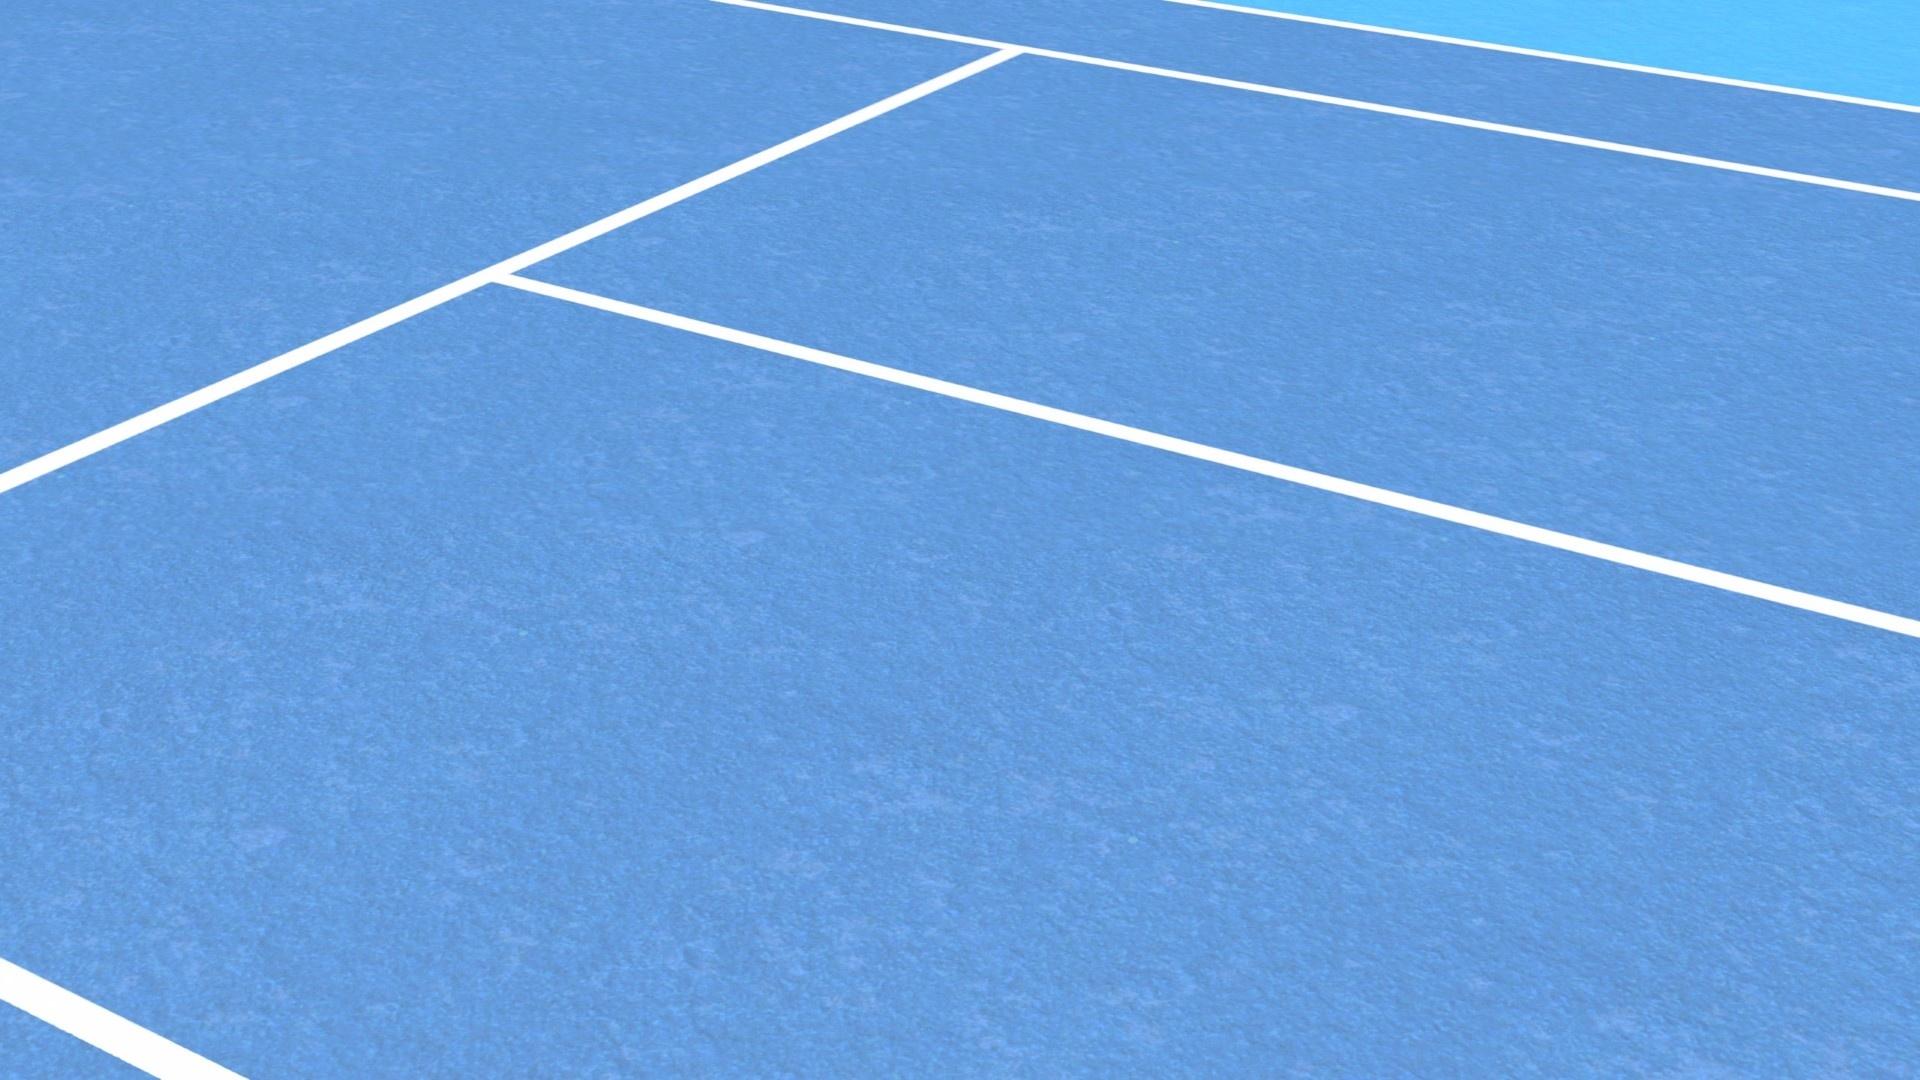 Tennis Ball free background